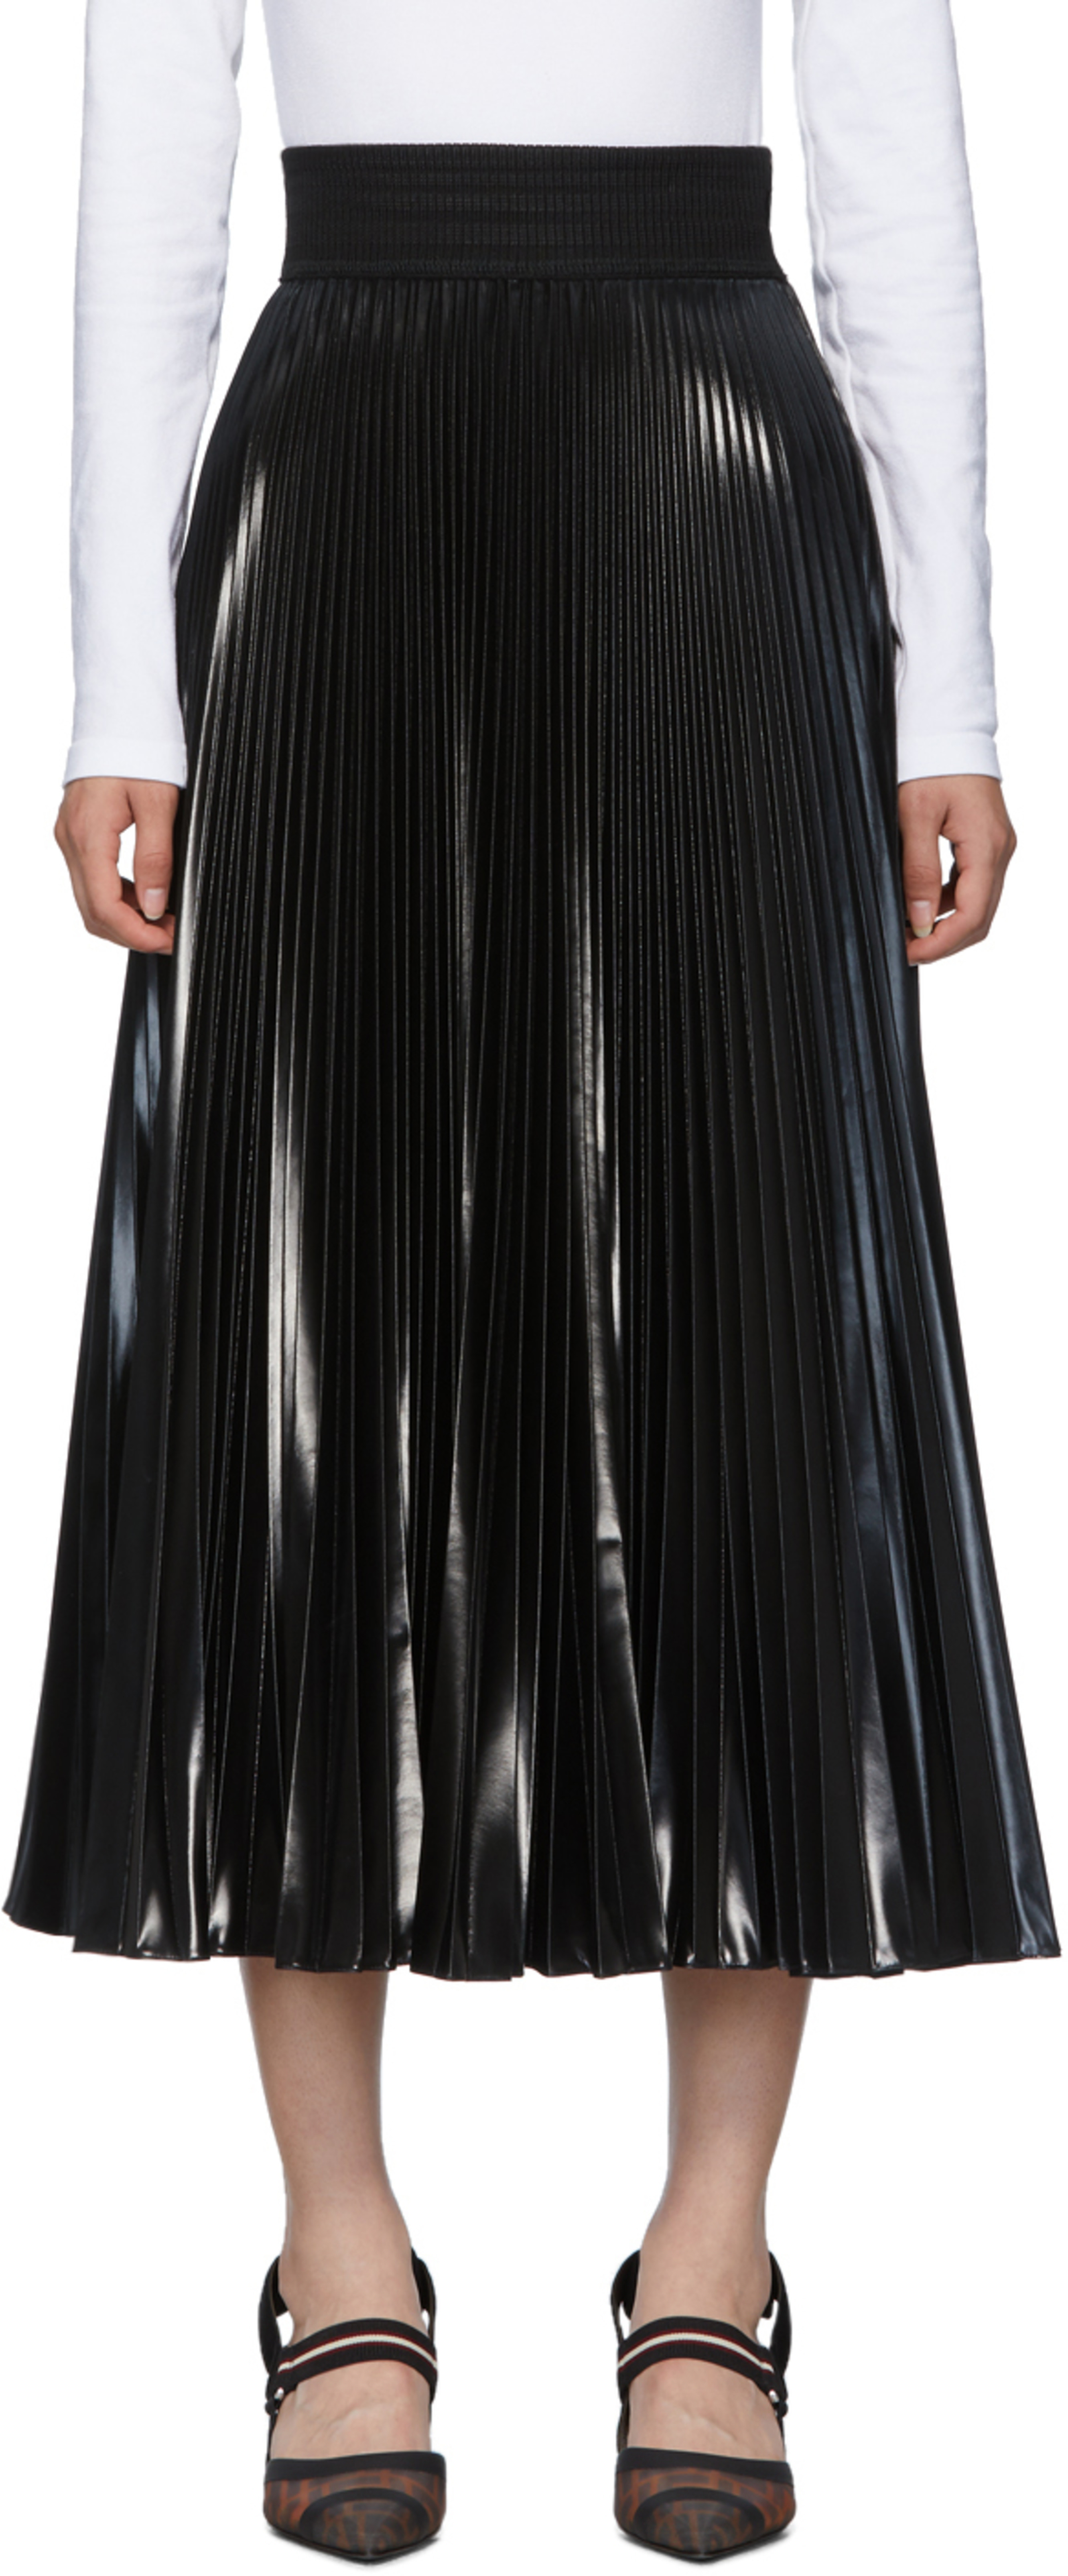 8c8aee7d11 Designer skirts for Women | SSENSE Canada